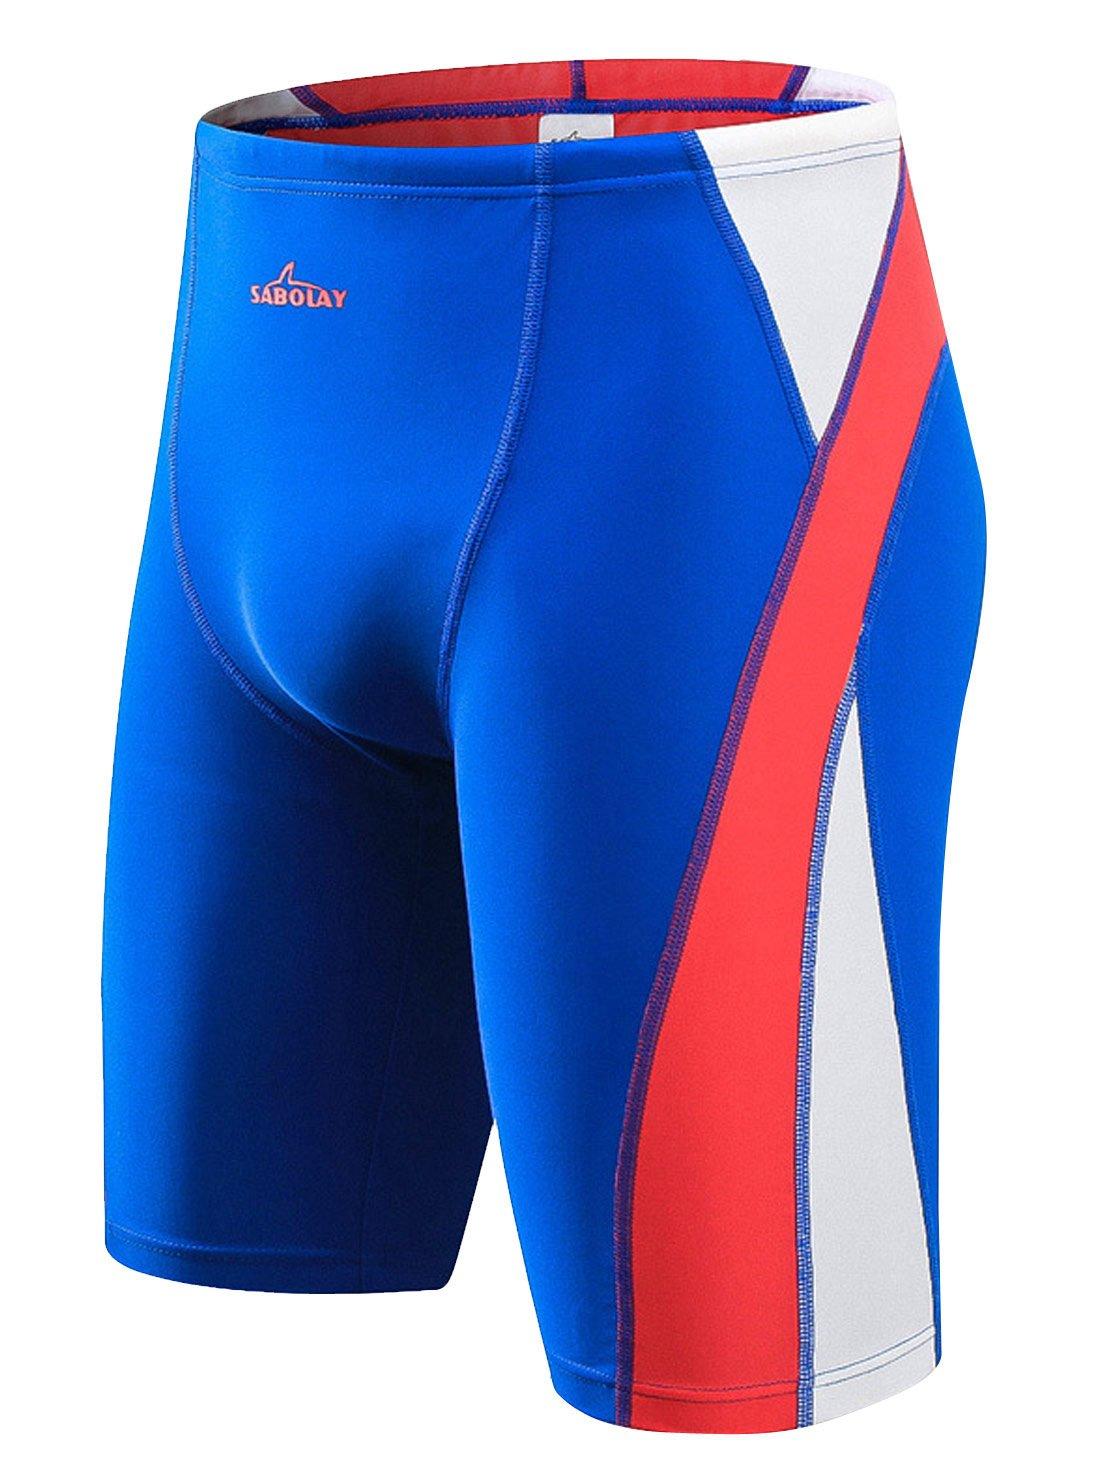 SABOLAY Men's Quick Dry Swim Pants UV Sun Protective Summer Shorts Jammer Leggings Short Spliced Rah Guard Swimwear L